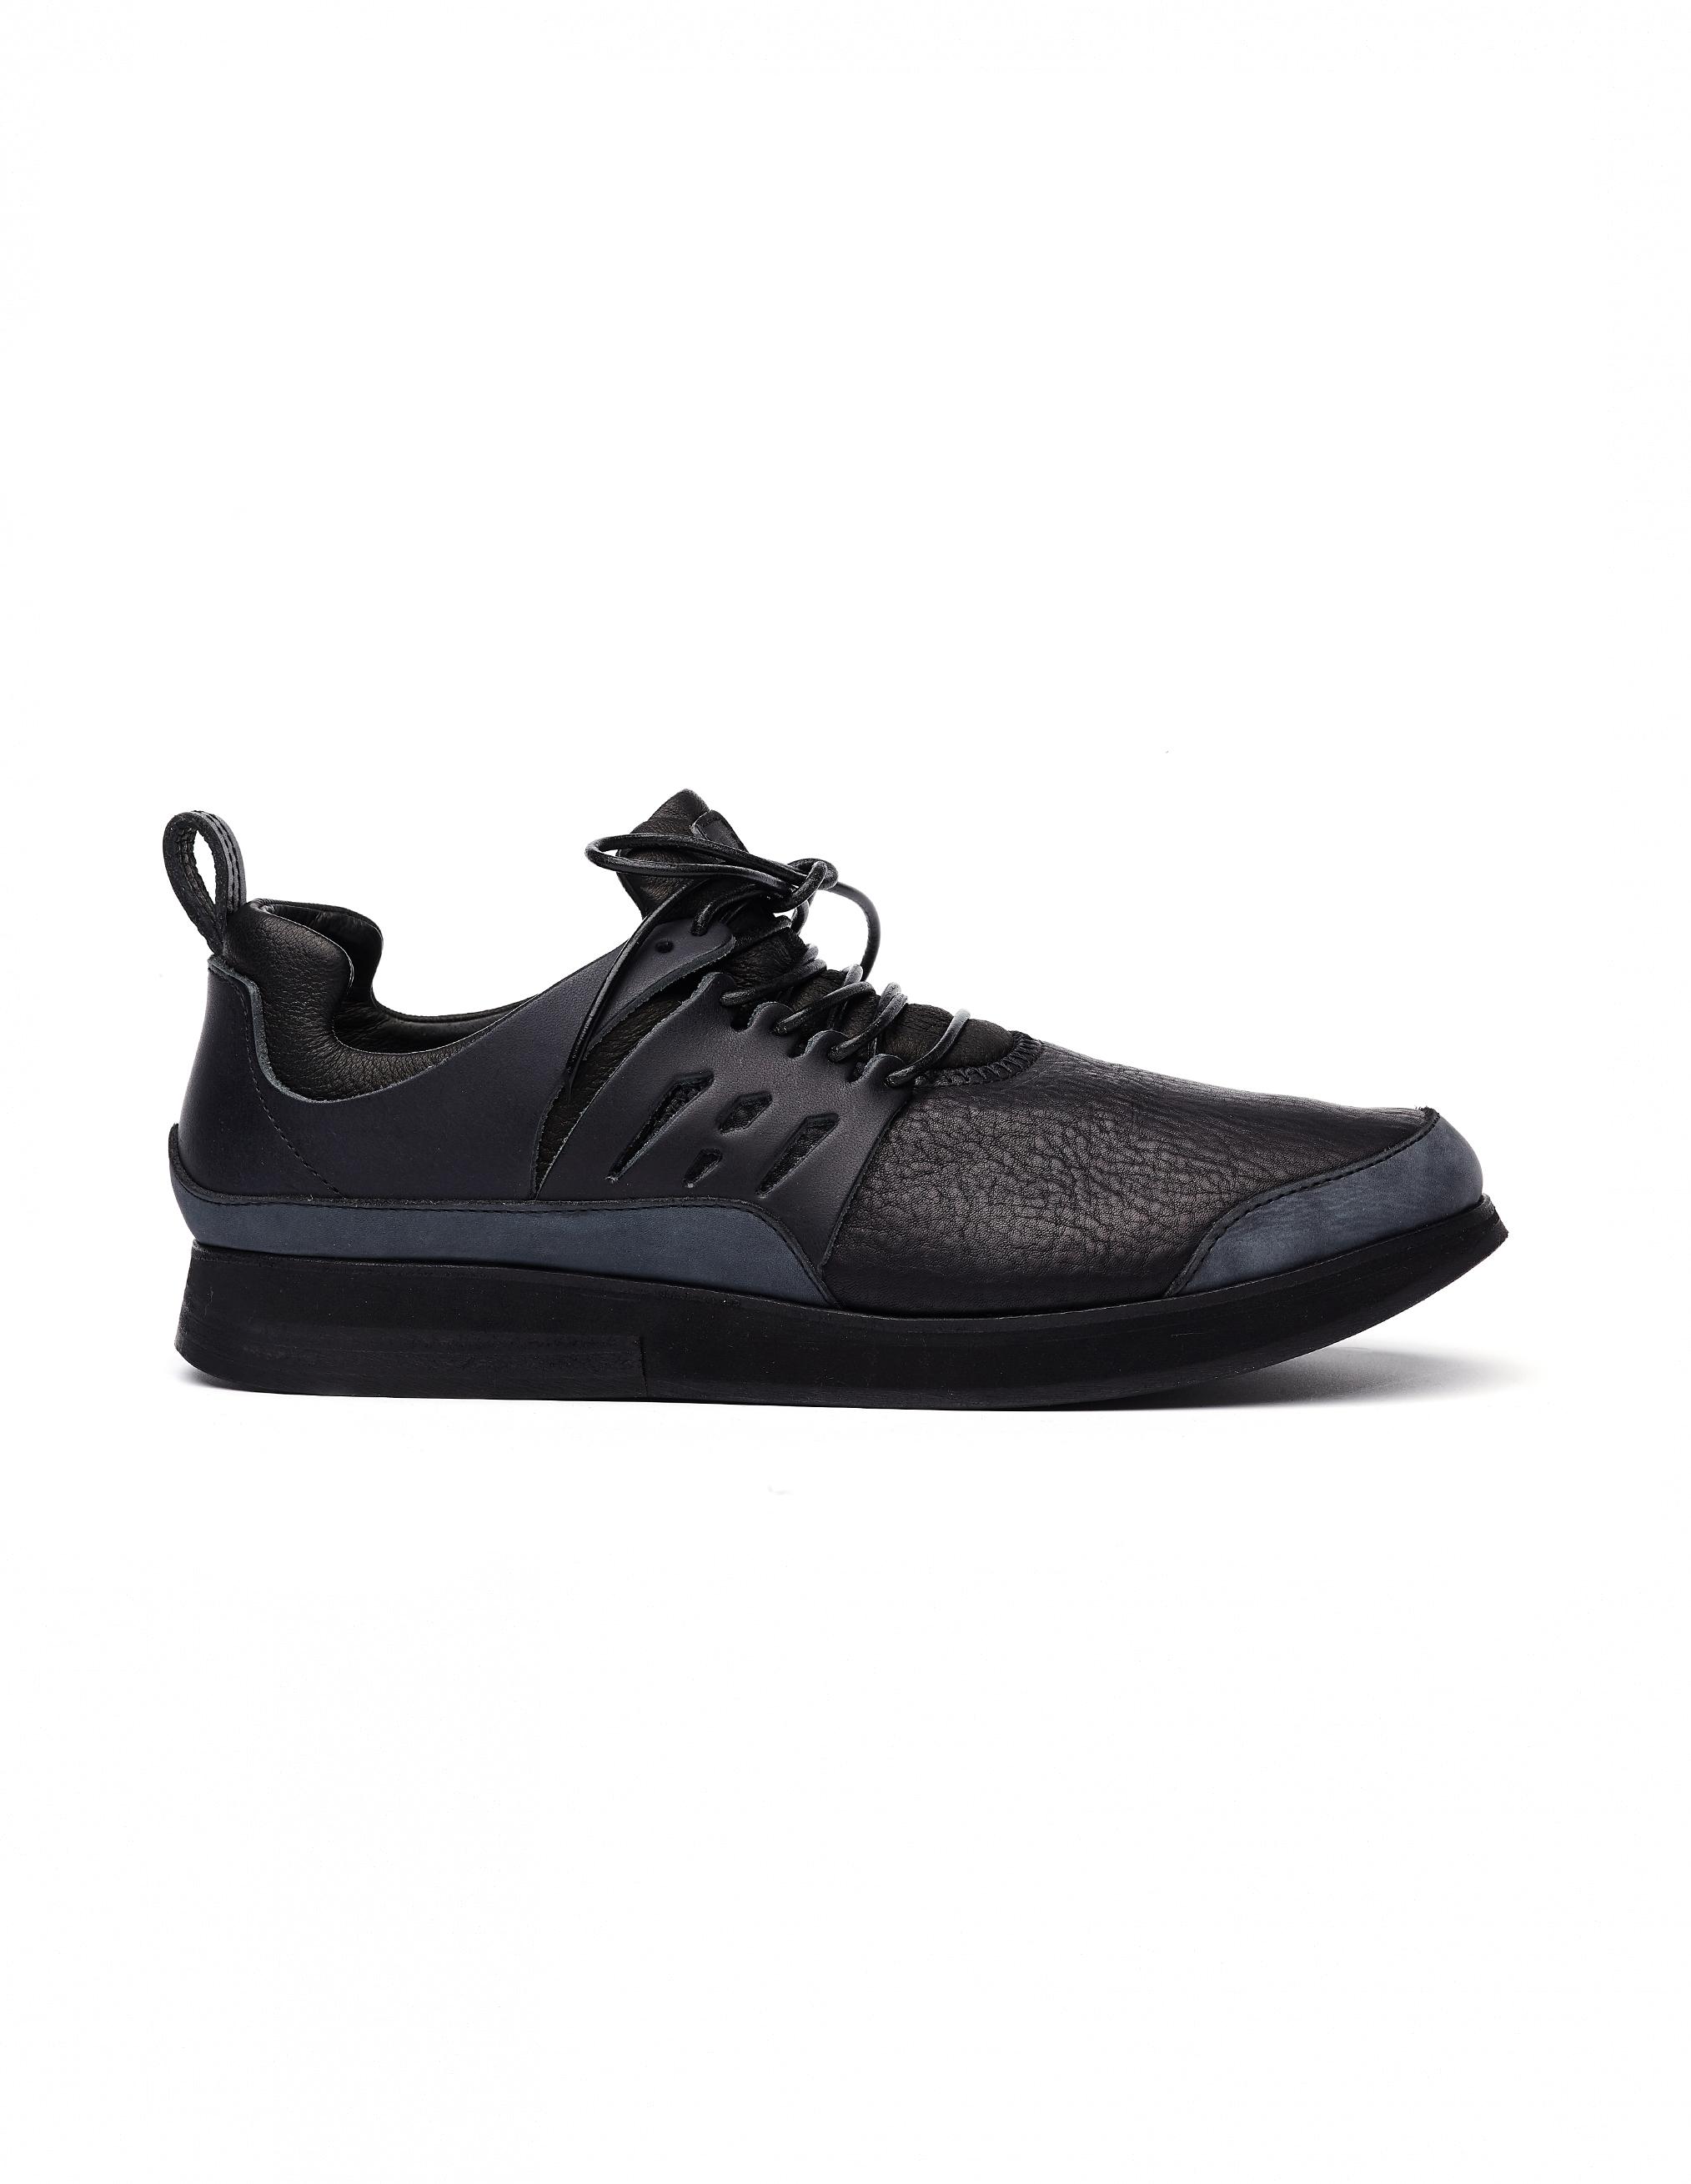 Hender Scheme Manual Industrial Products 12 Sneakers